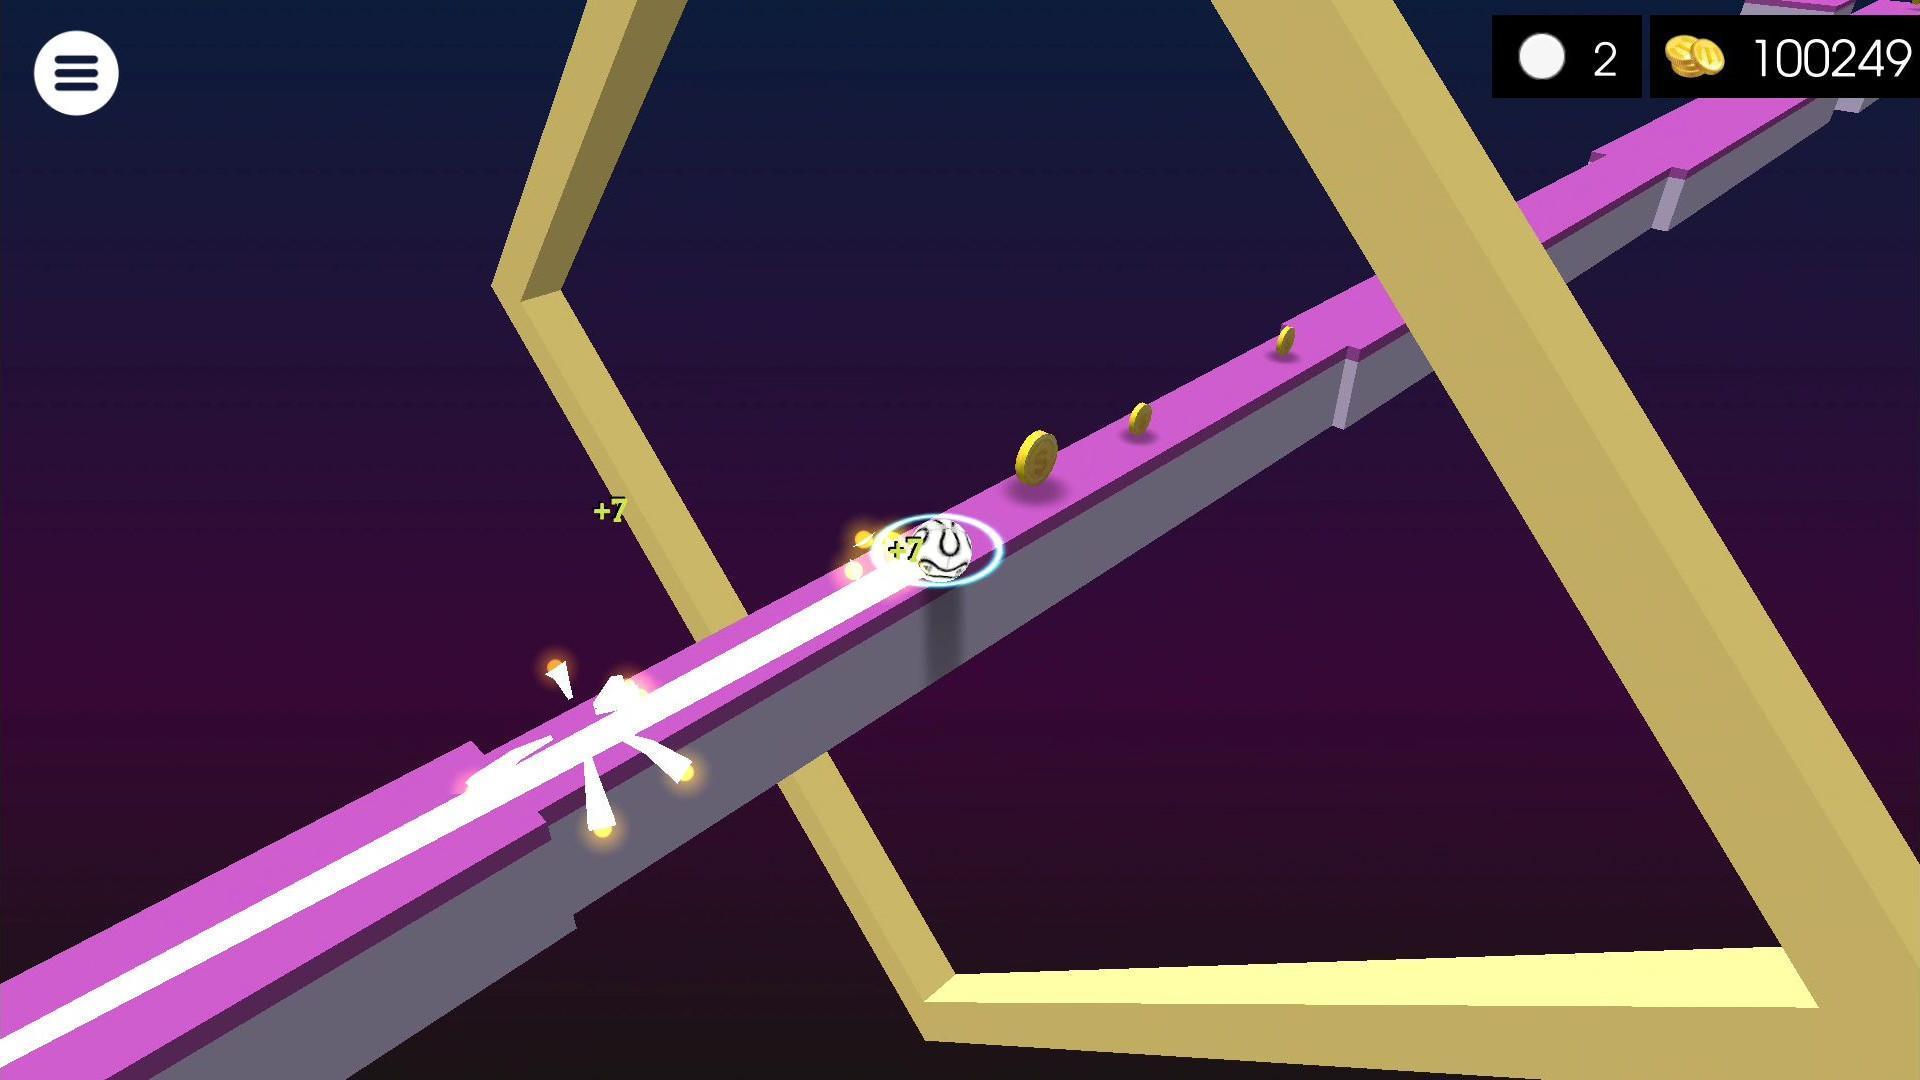 RYWO free 3D roll ball game 1.2.3 Screenshot 18